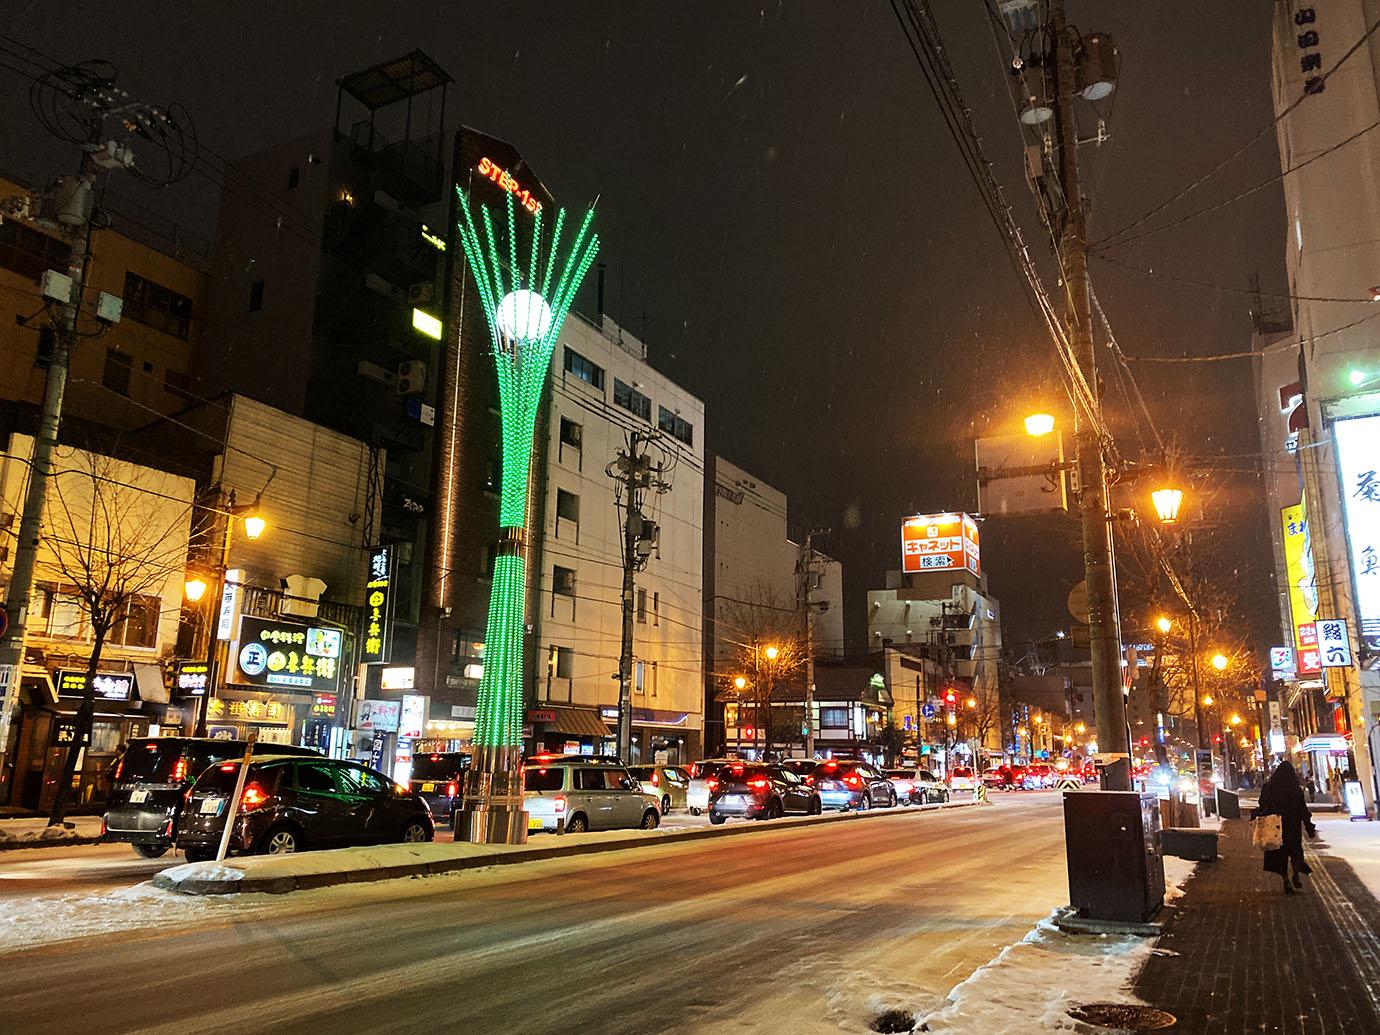 hokkaido-asahikawa-jingisukan11